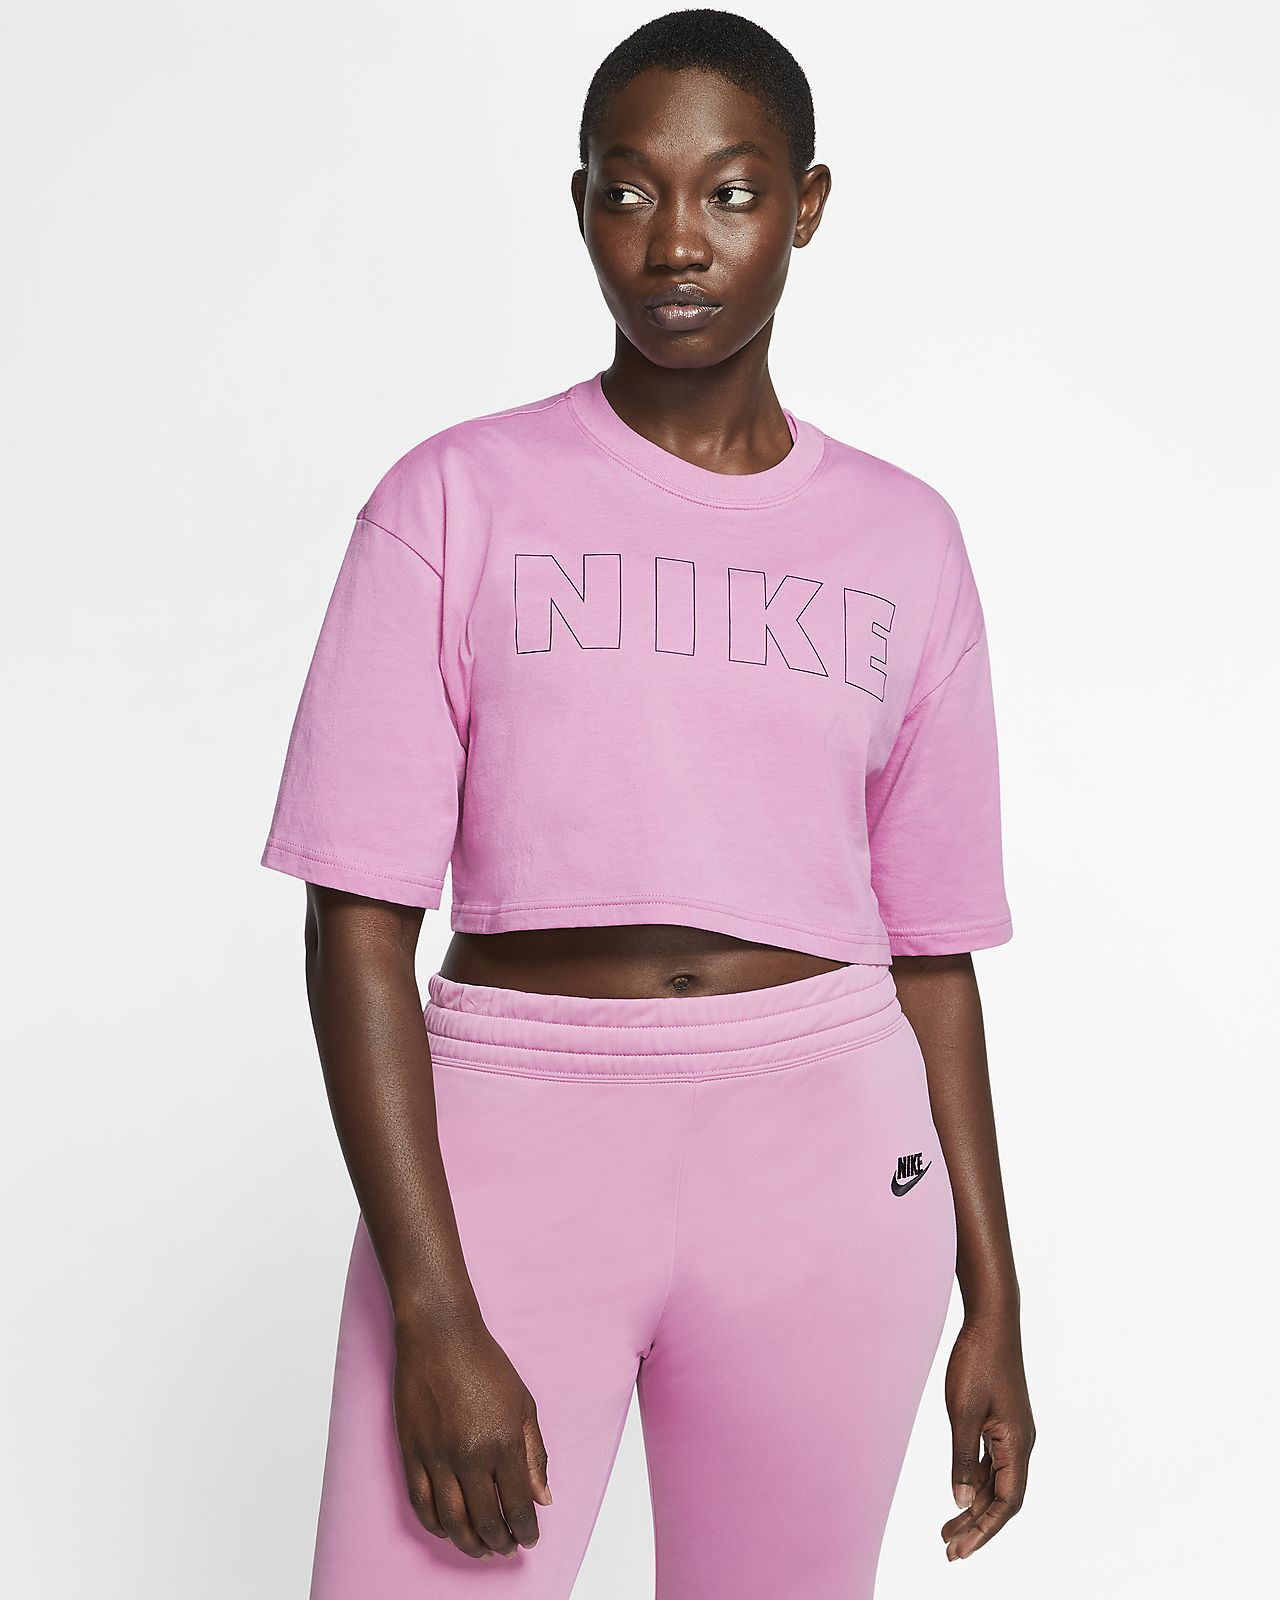 Nike Air Kort T shirt voor dames. Nike NL